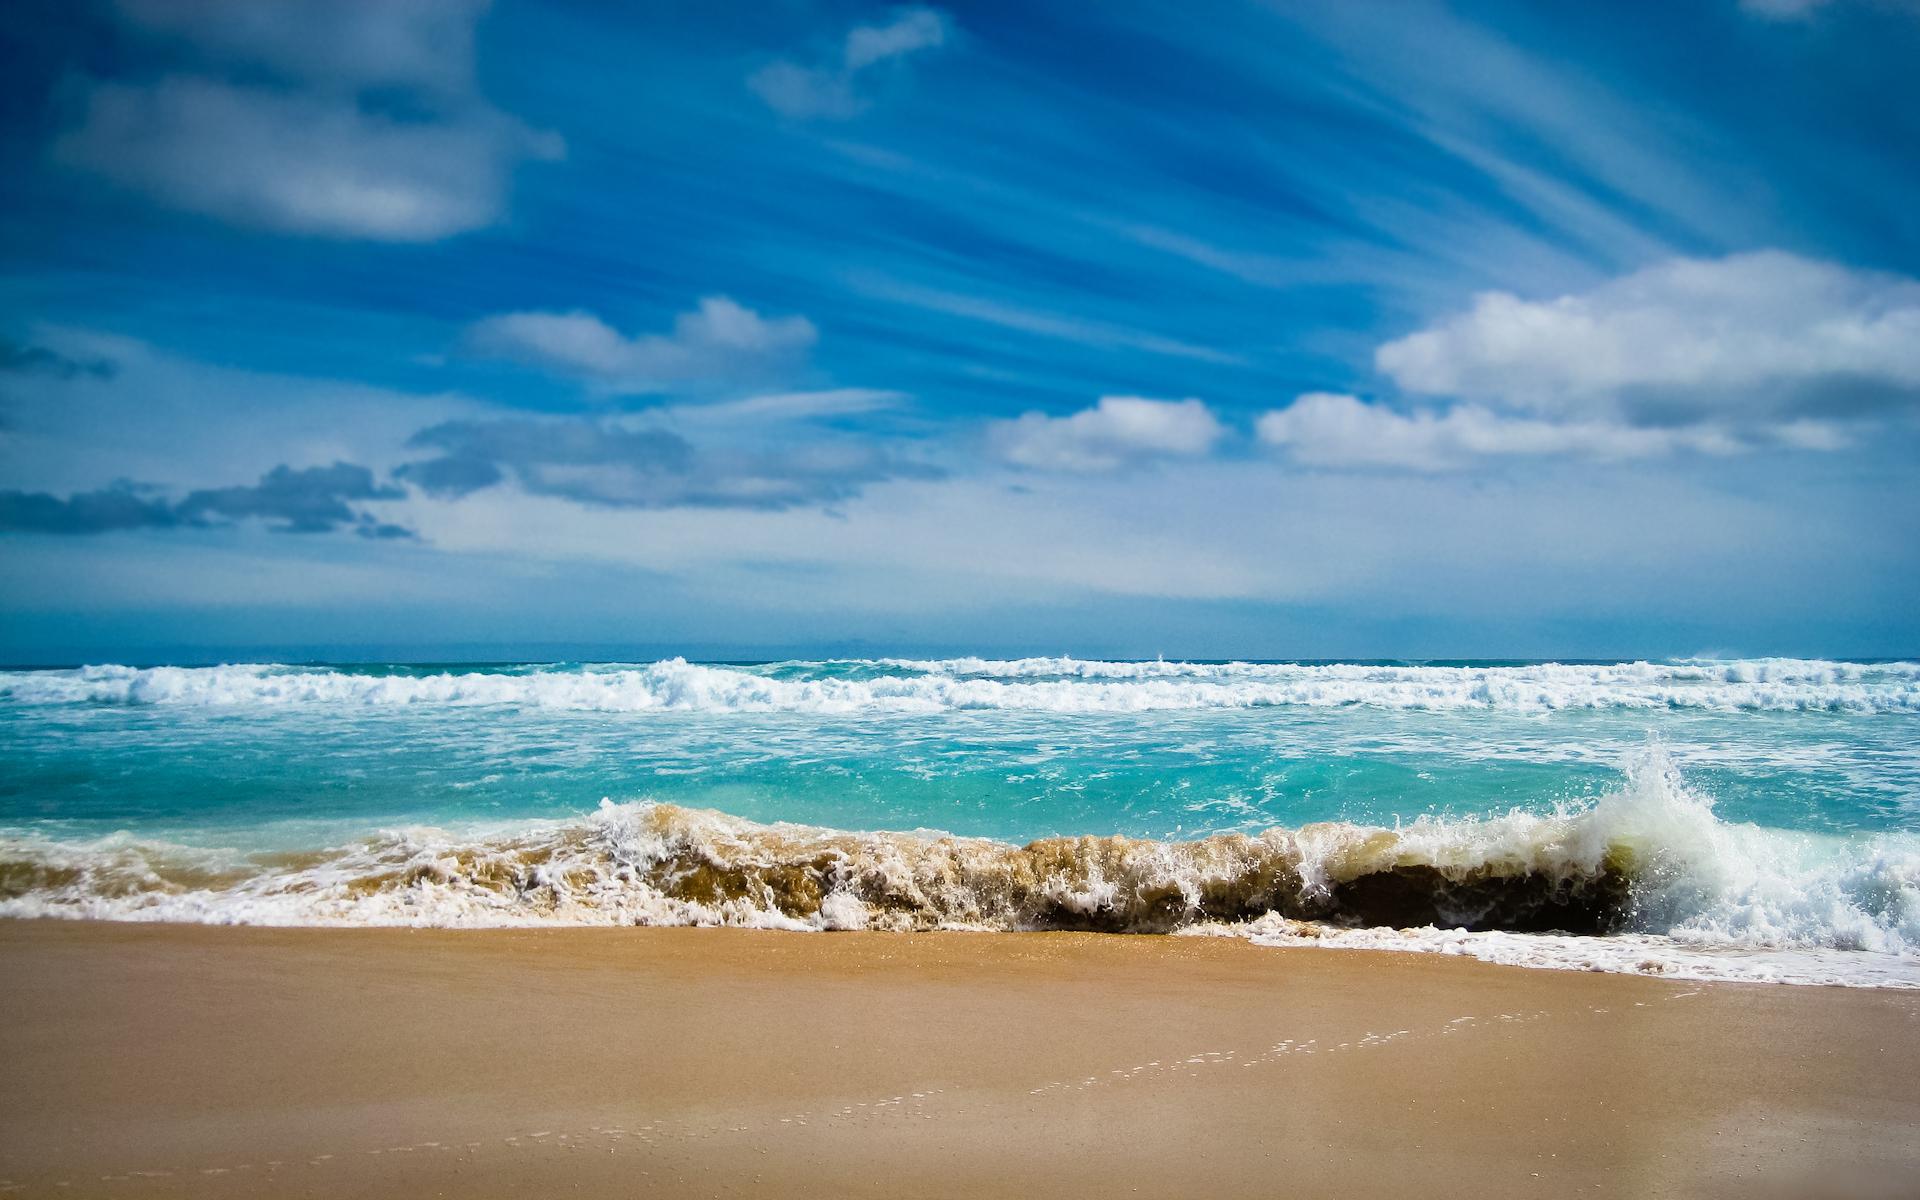 Ocean Wallpaper Landscapes Sea Water Foam Wave Waves Sand Pictures 1920x1200